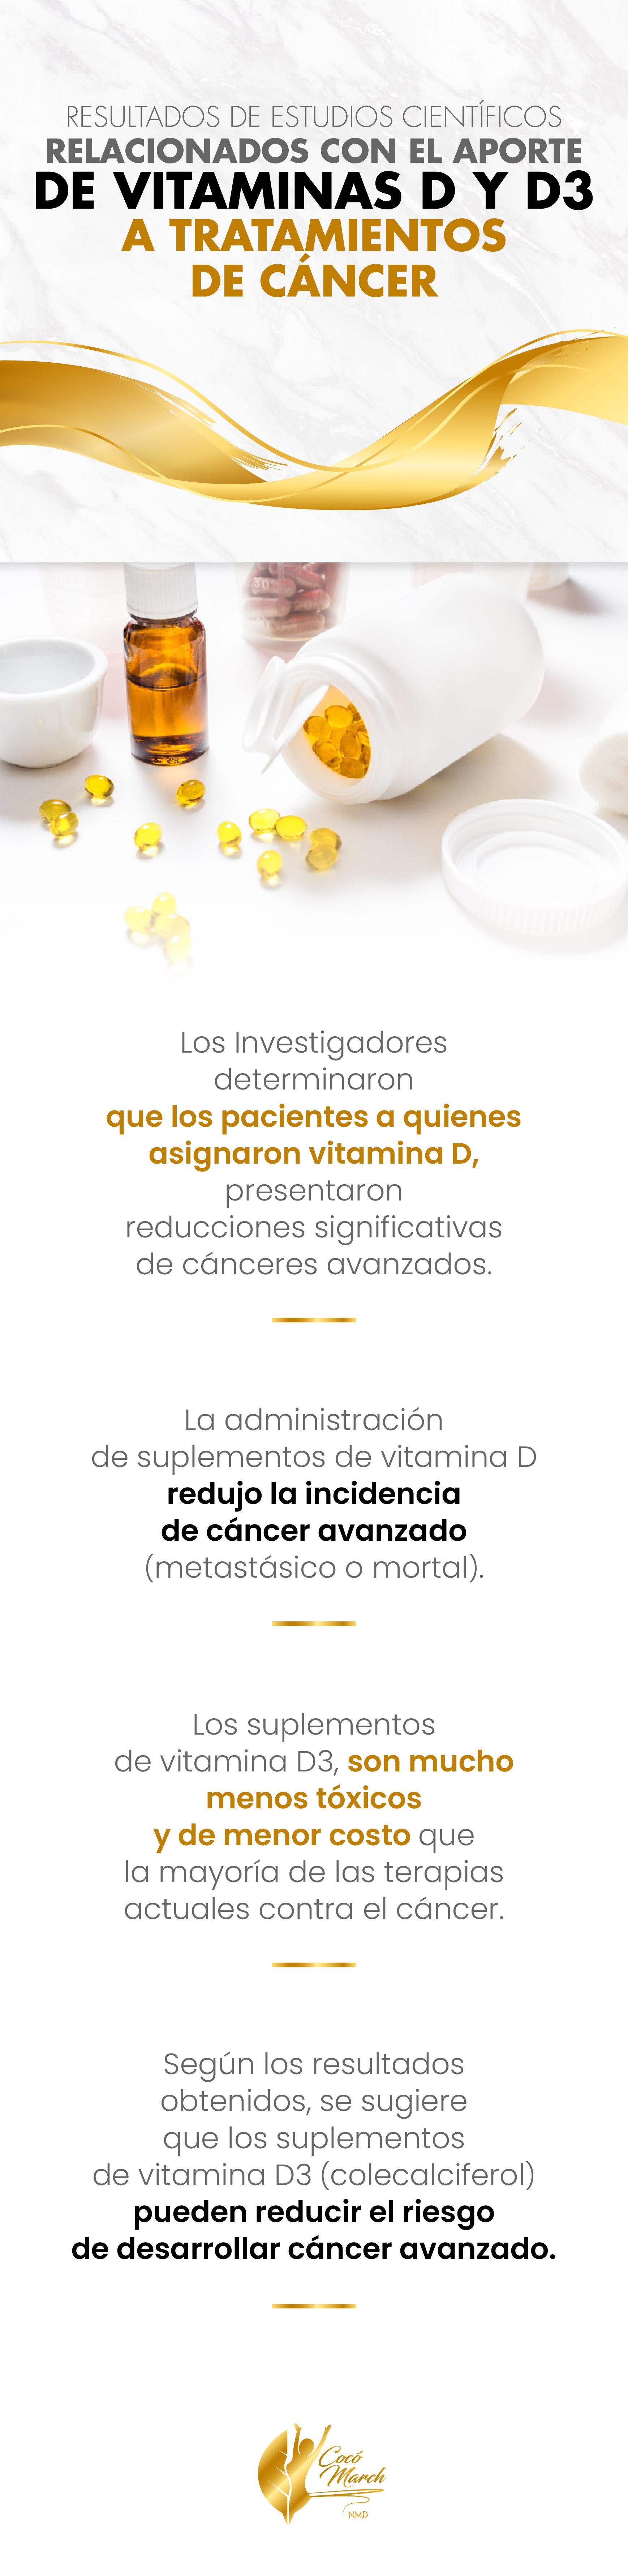 aporte-de-vitamina-d-en-tratamientos-de-cancer